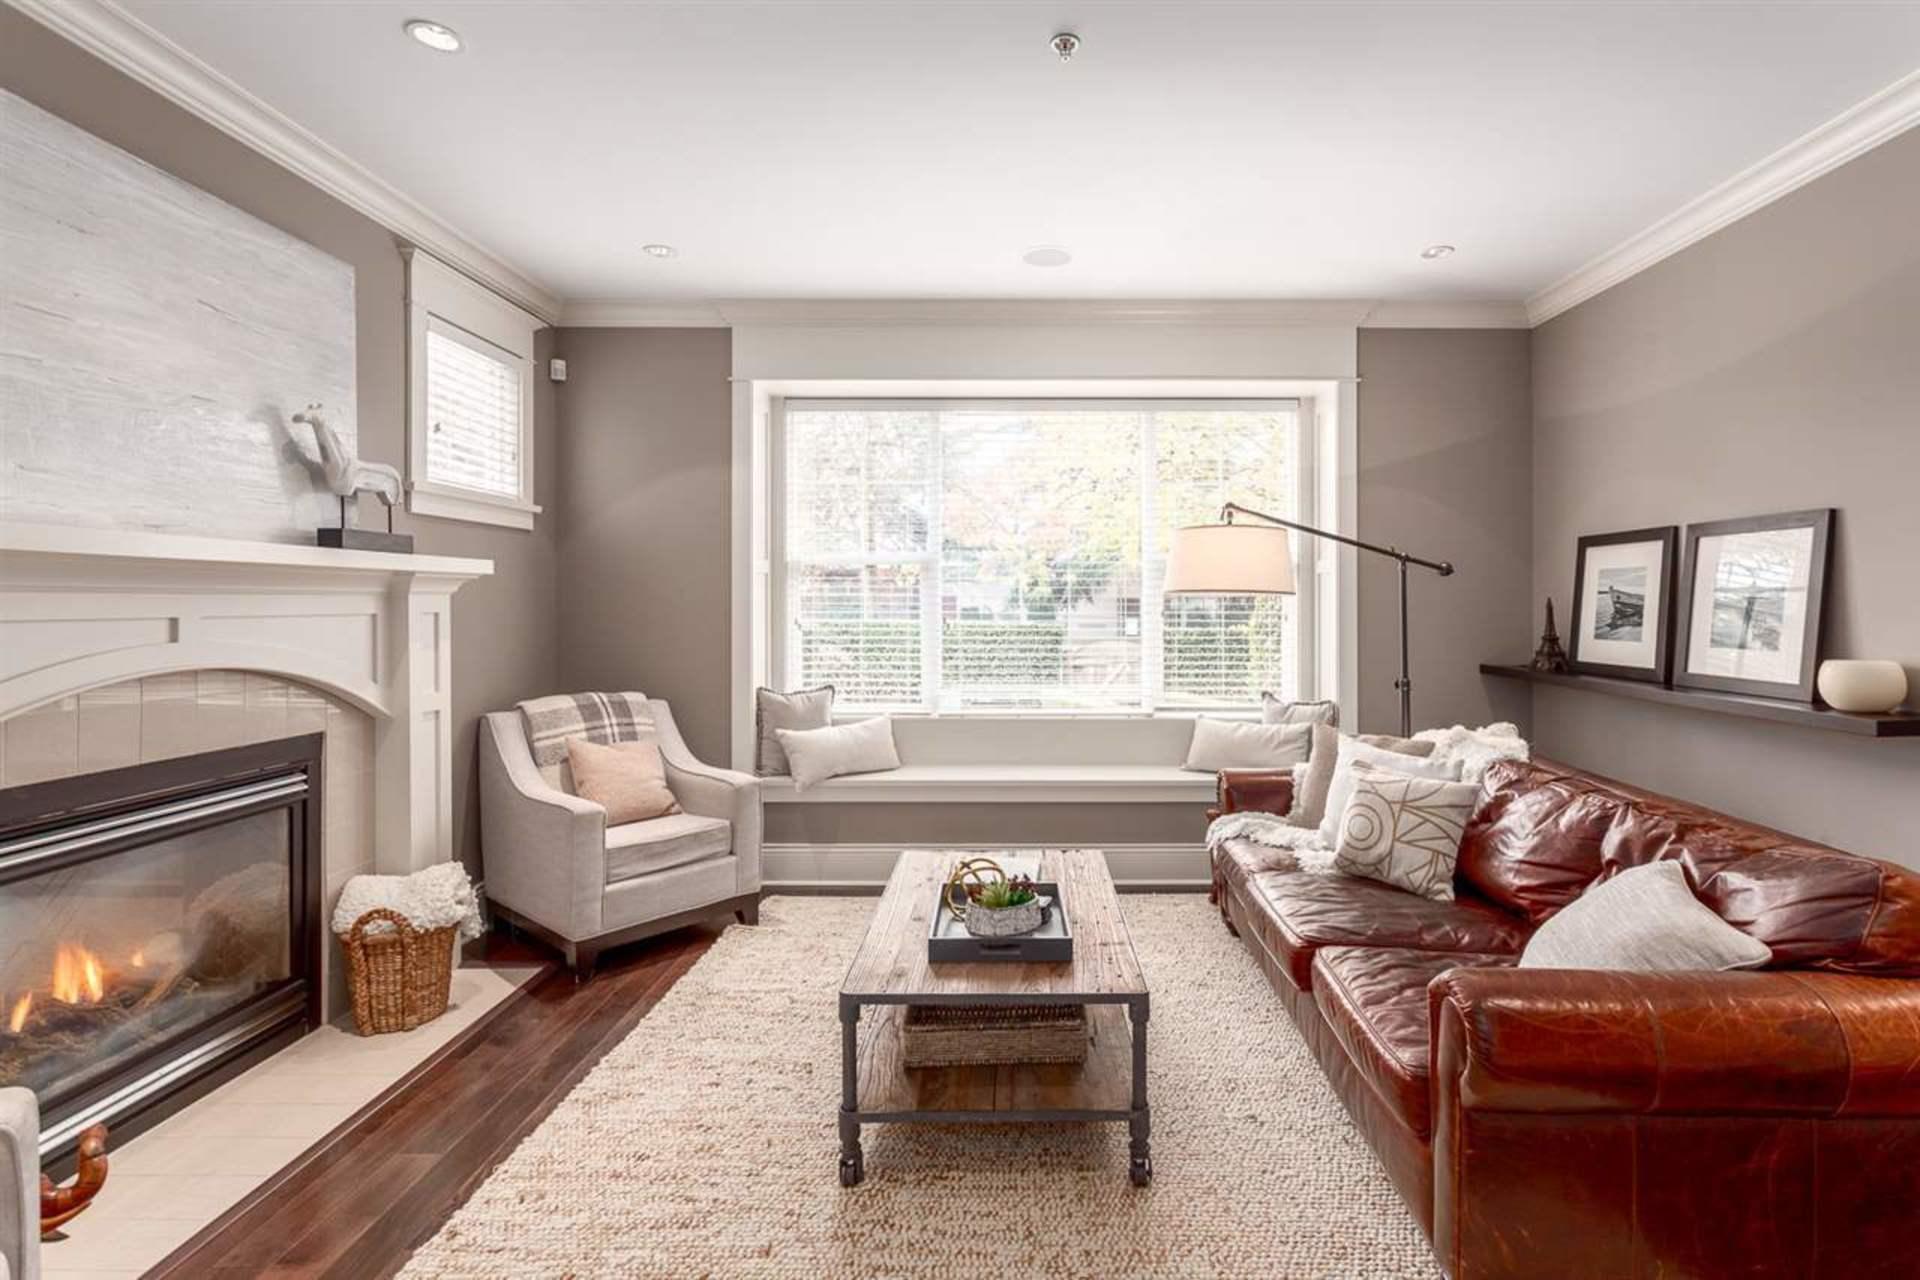 2455-cambridge-street-hastings-east-vancouver-east-04 at 2455 Cambridge Street, Hastings East, Vancouver East